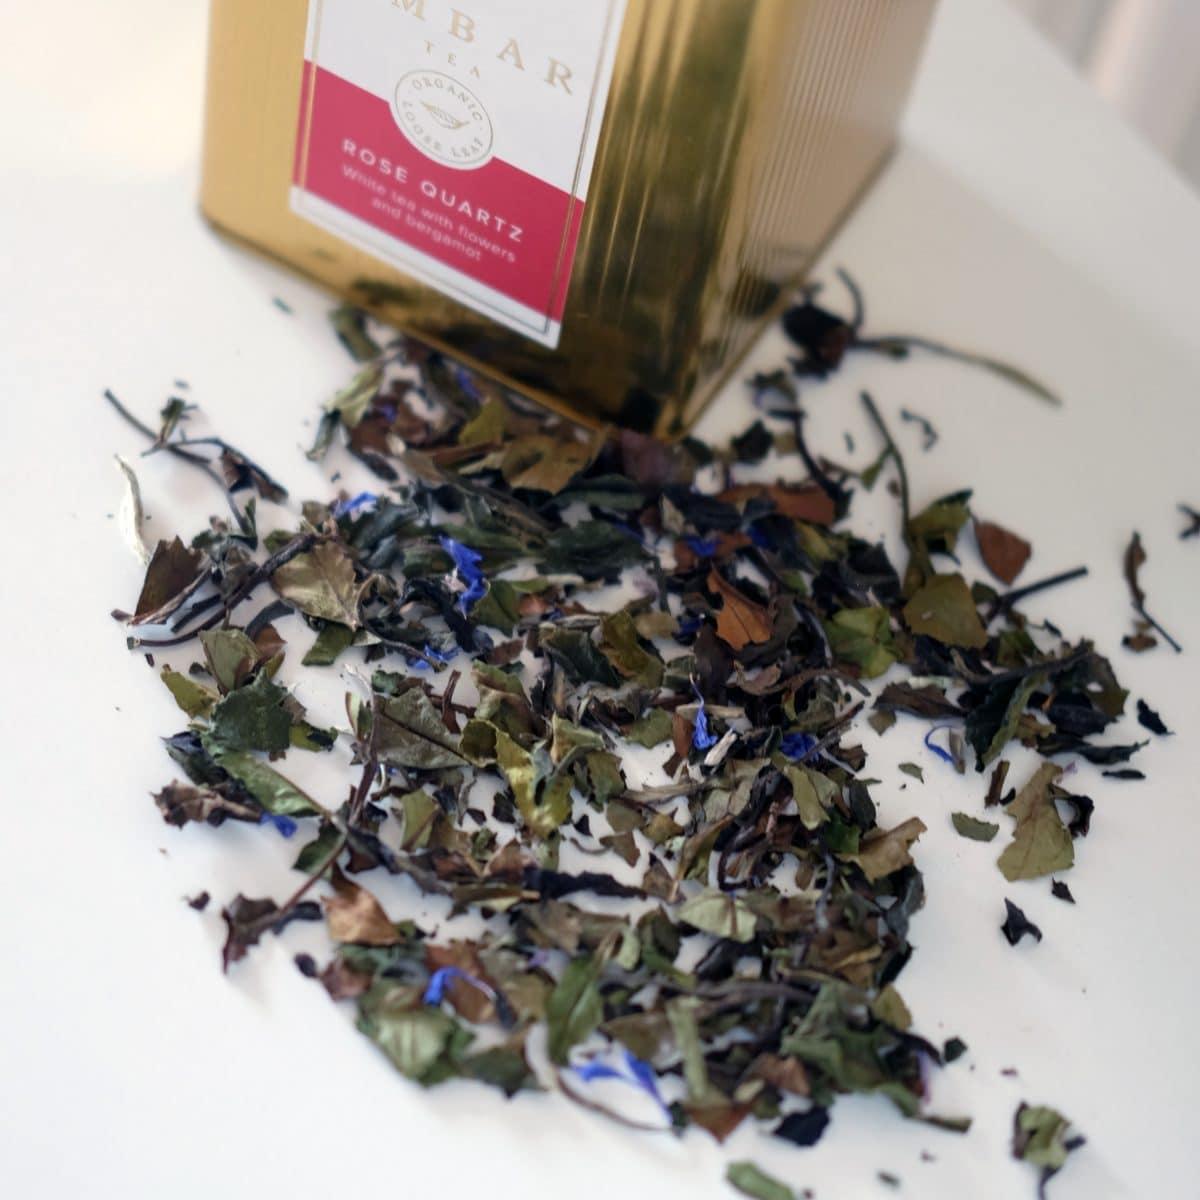 Rose Quartz Ambar Tea